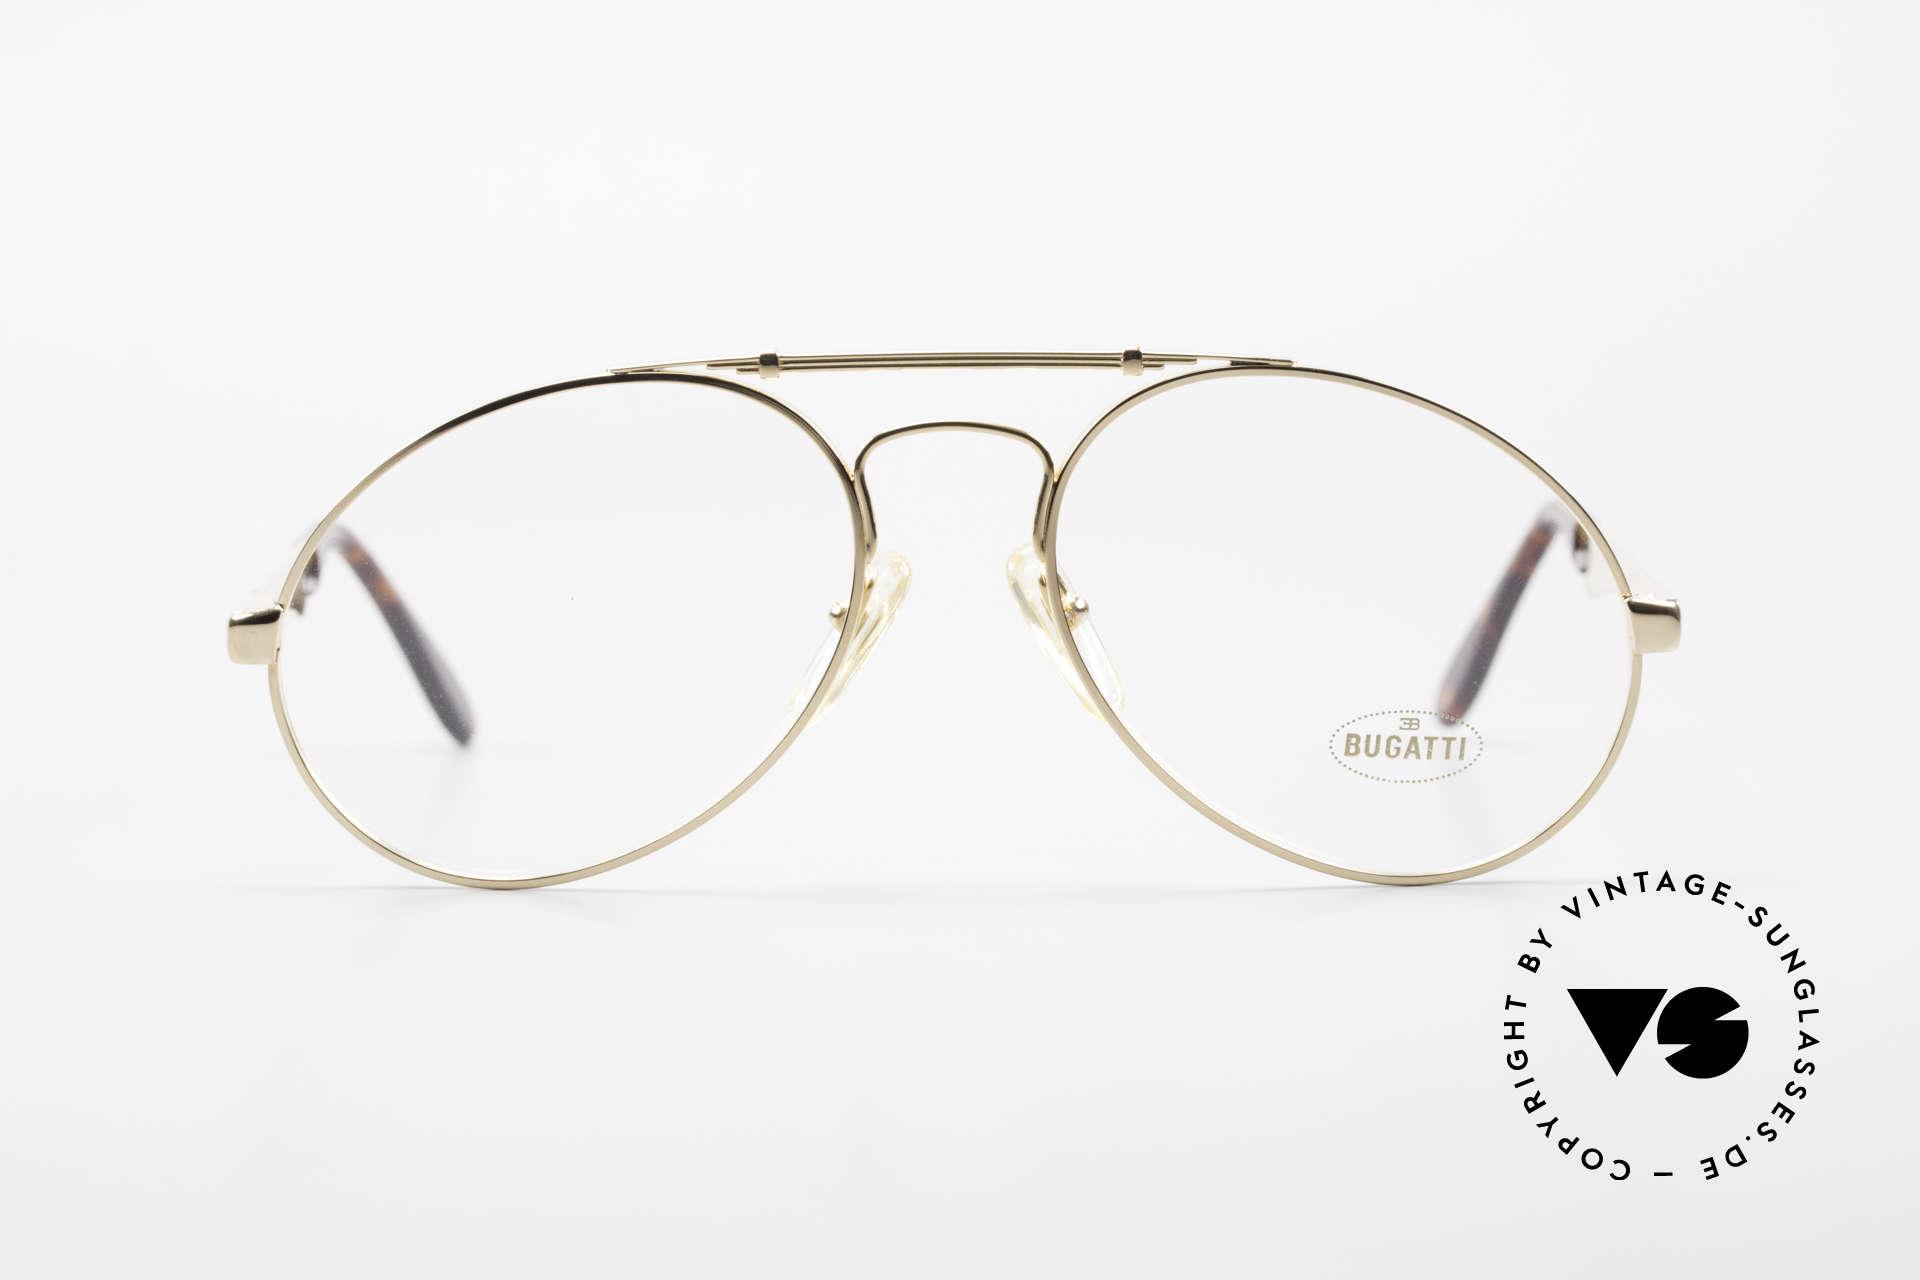 Bugatti 11945 Large Luxury 80's Eyeglasses, the Bugatti CLASSIC par excellence, a legend!, Made for Men